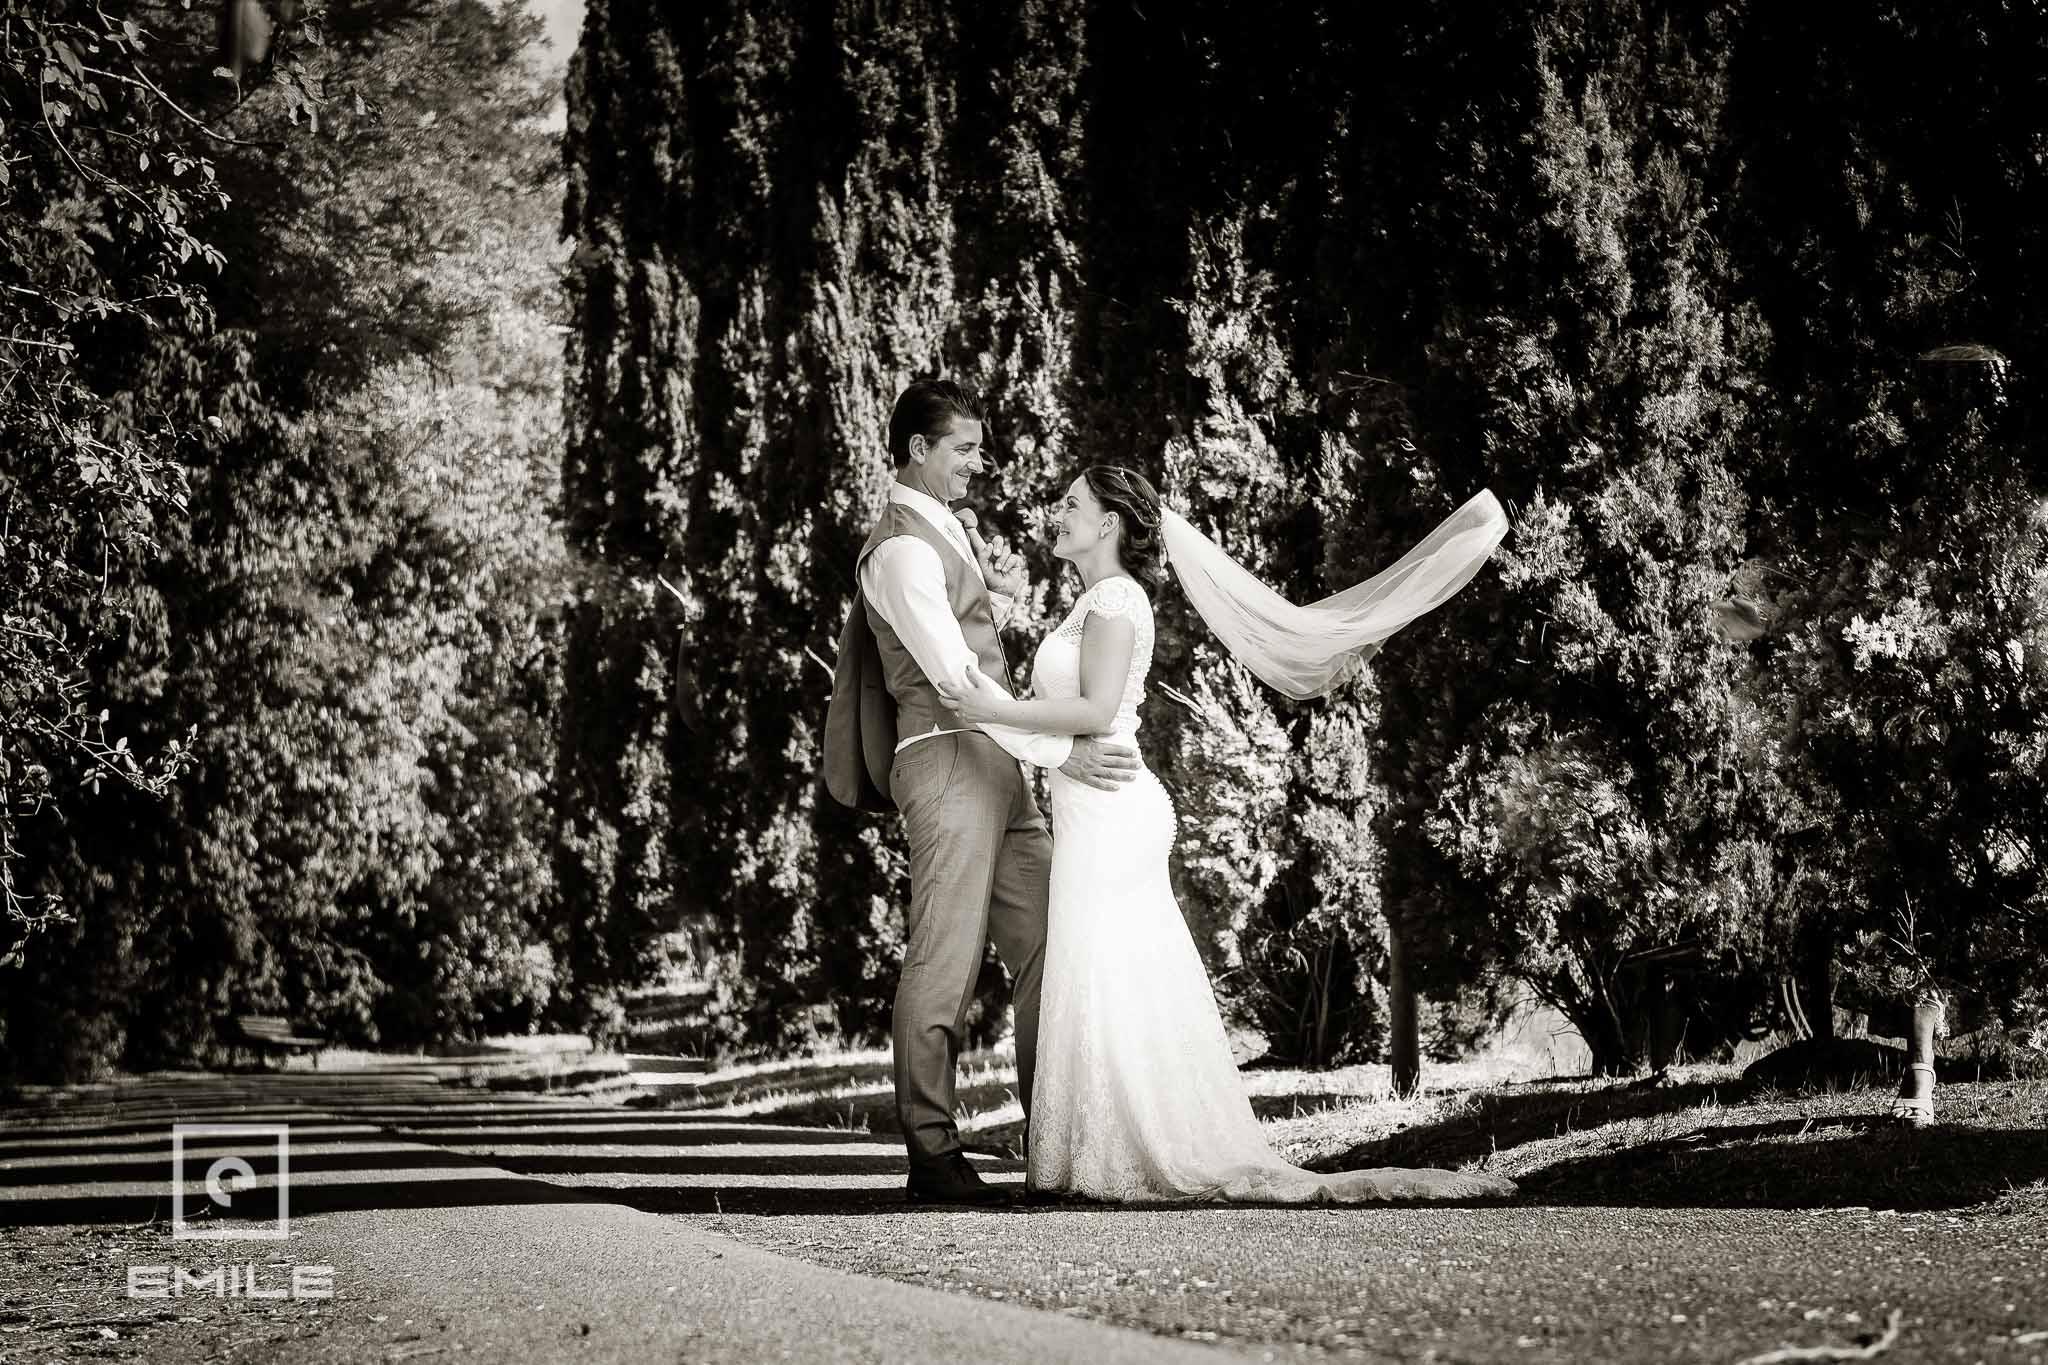 Opwaaiende sluier bij ruine Poggibonsi - Destination wedding San Gimignano - Toscane Italie - Iris en Job